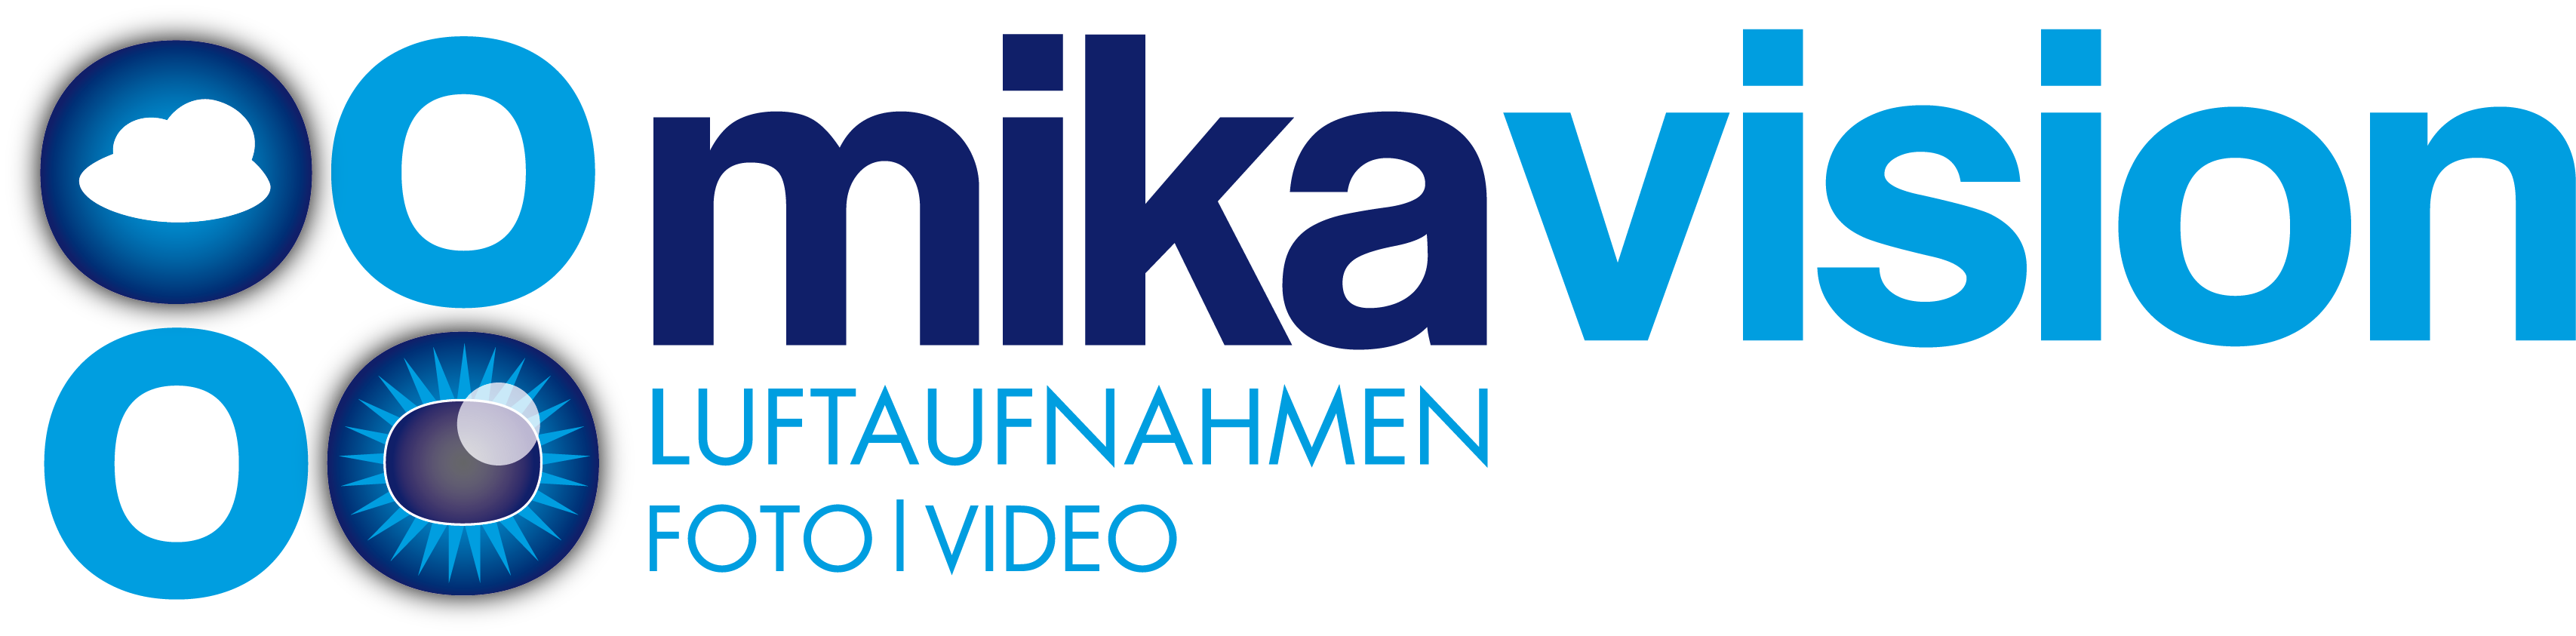 Mikavision